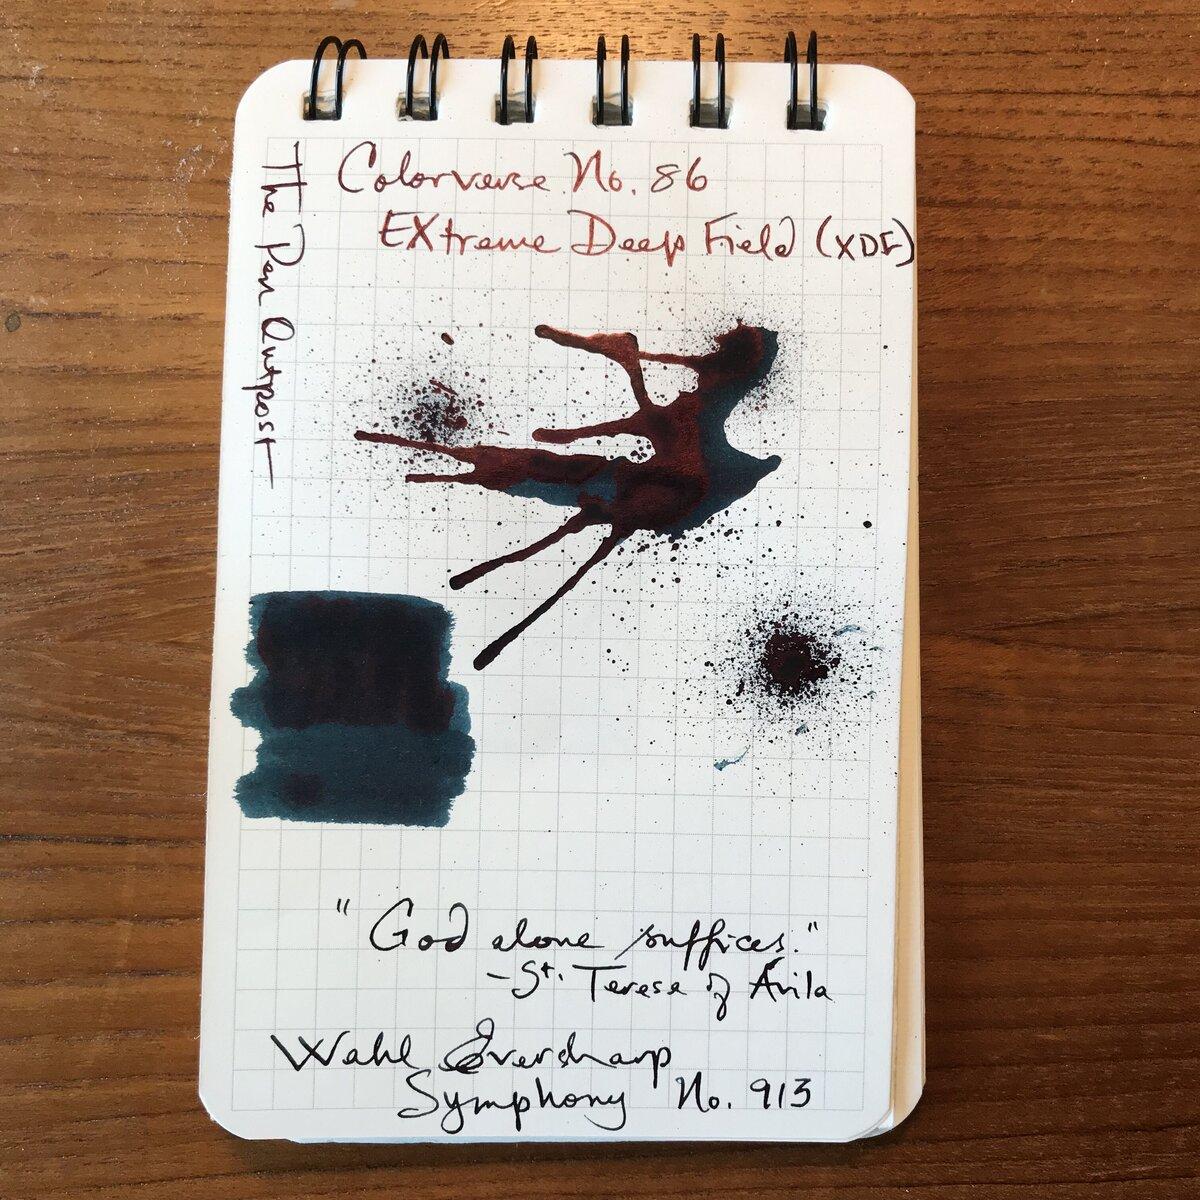 Colorverse No. 86 eXtreme Deep Field (XDF)